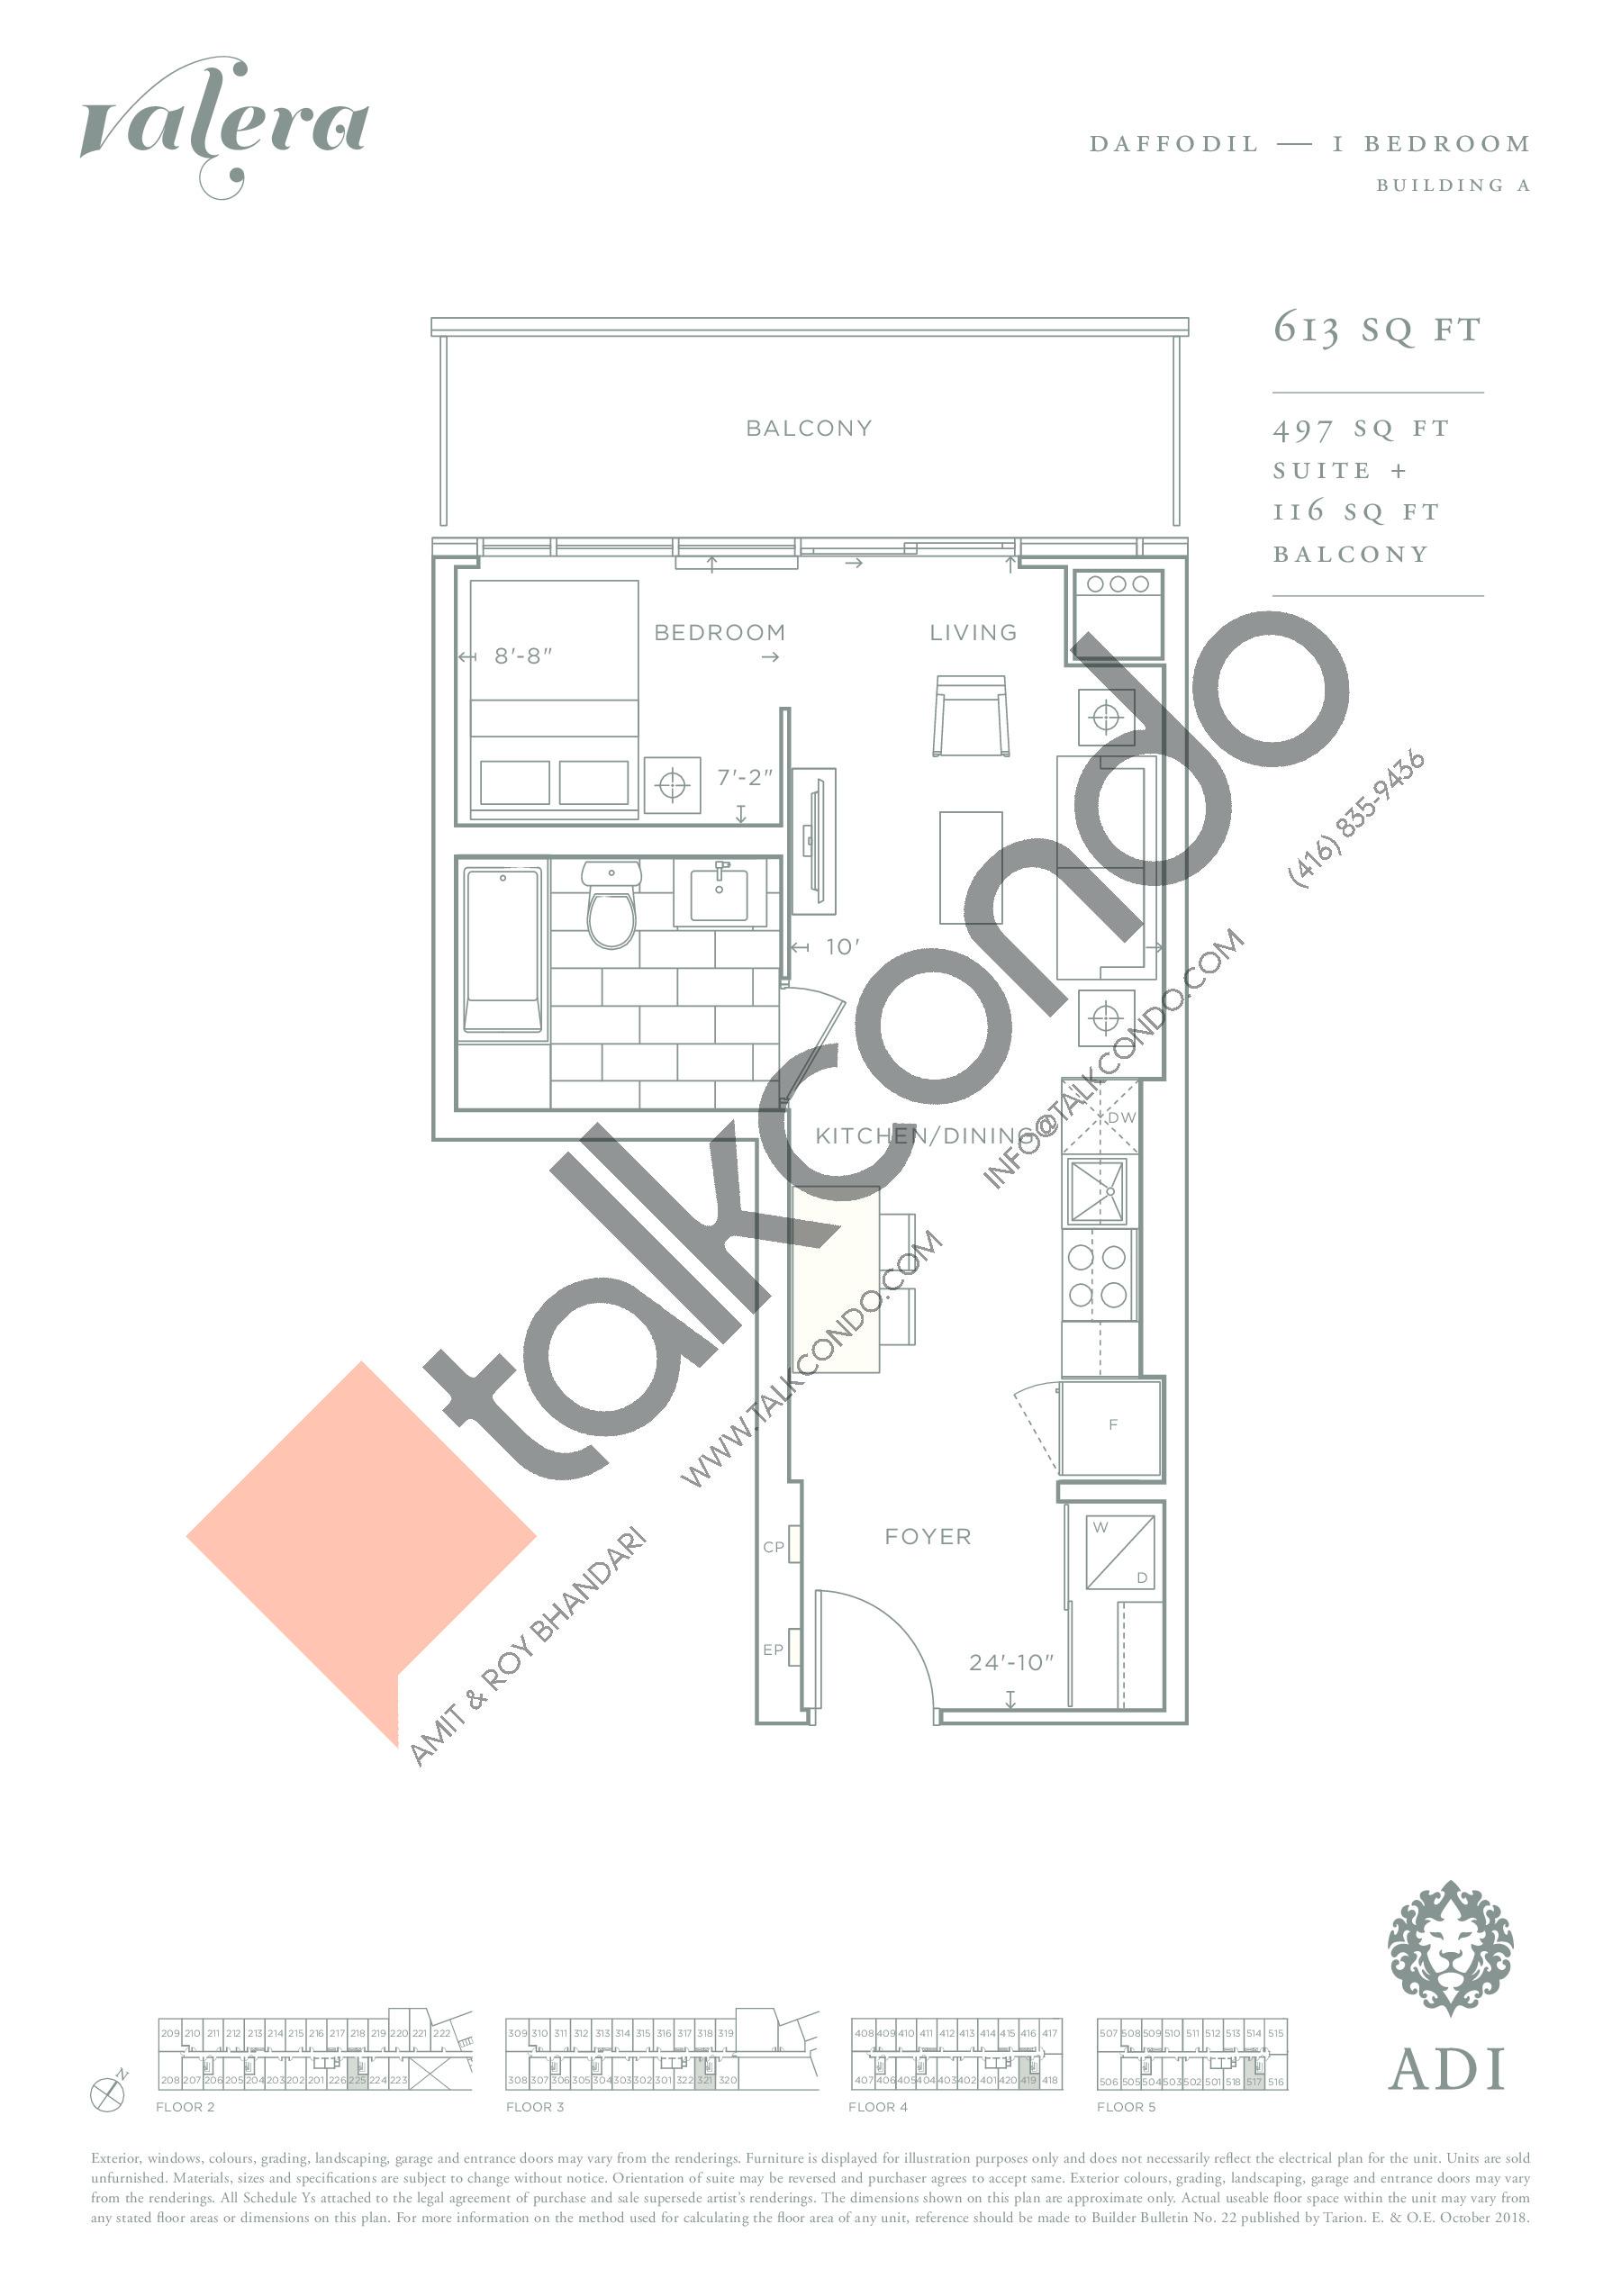 Daffodil Floor Plan at Valera Condos - 497 sq.ft